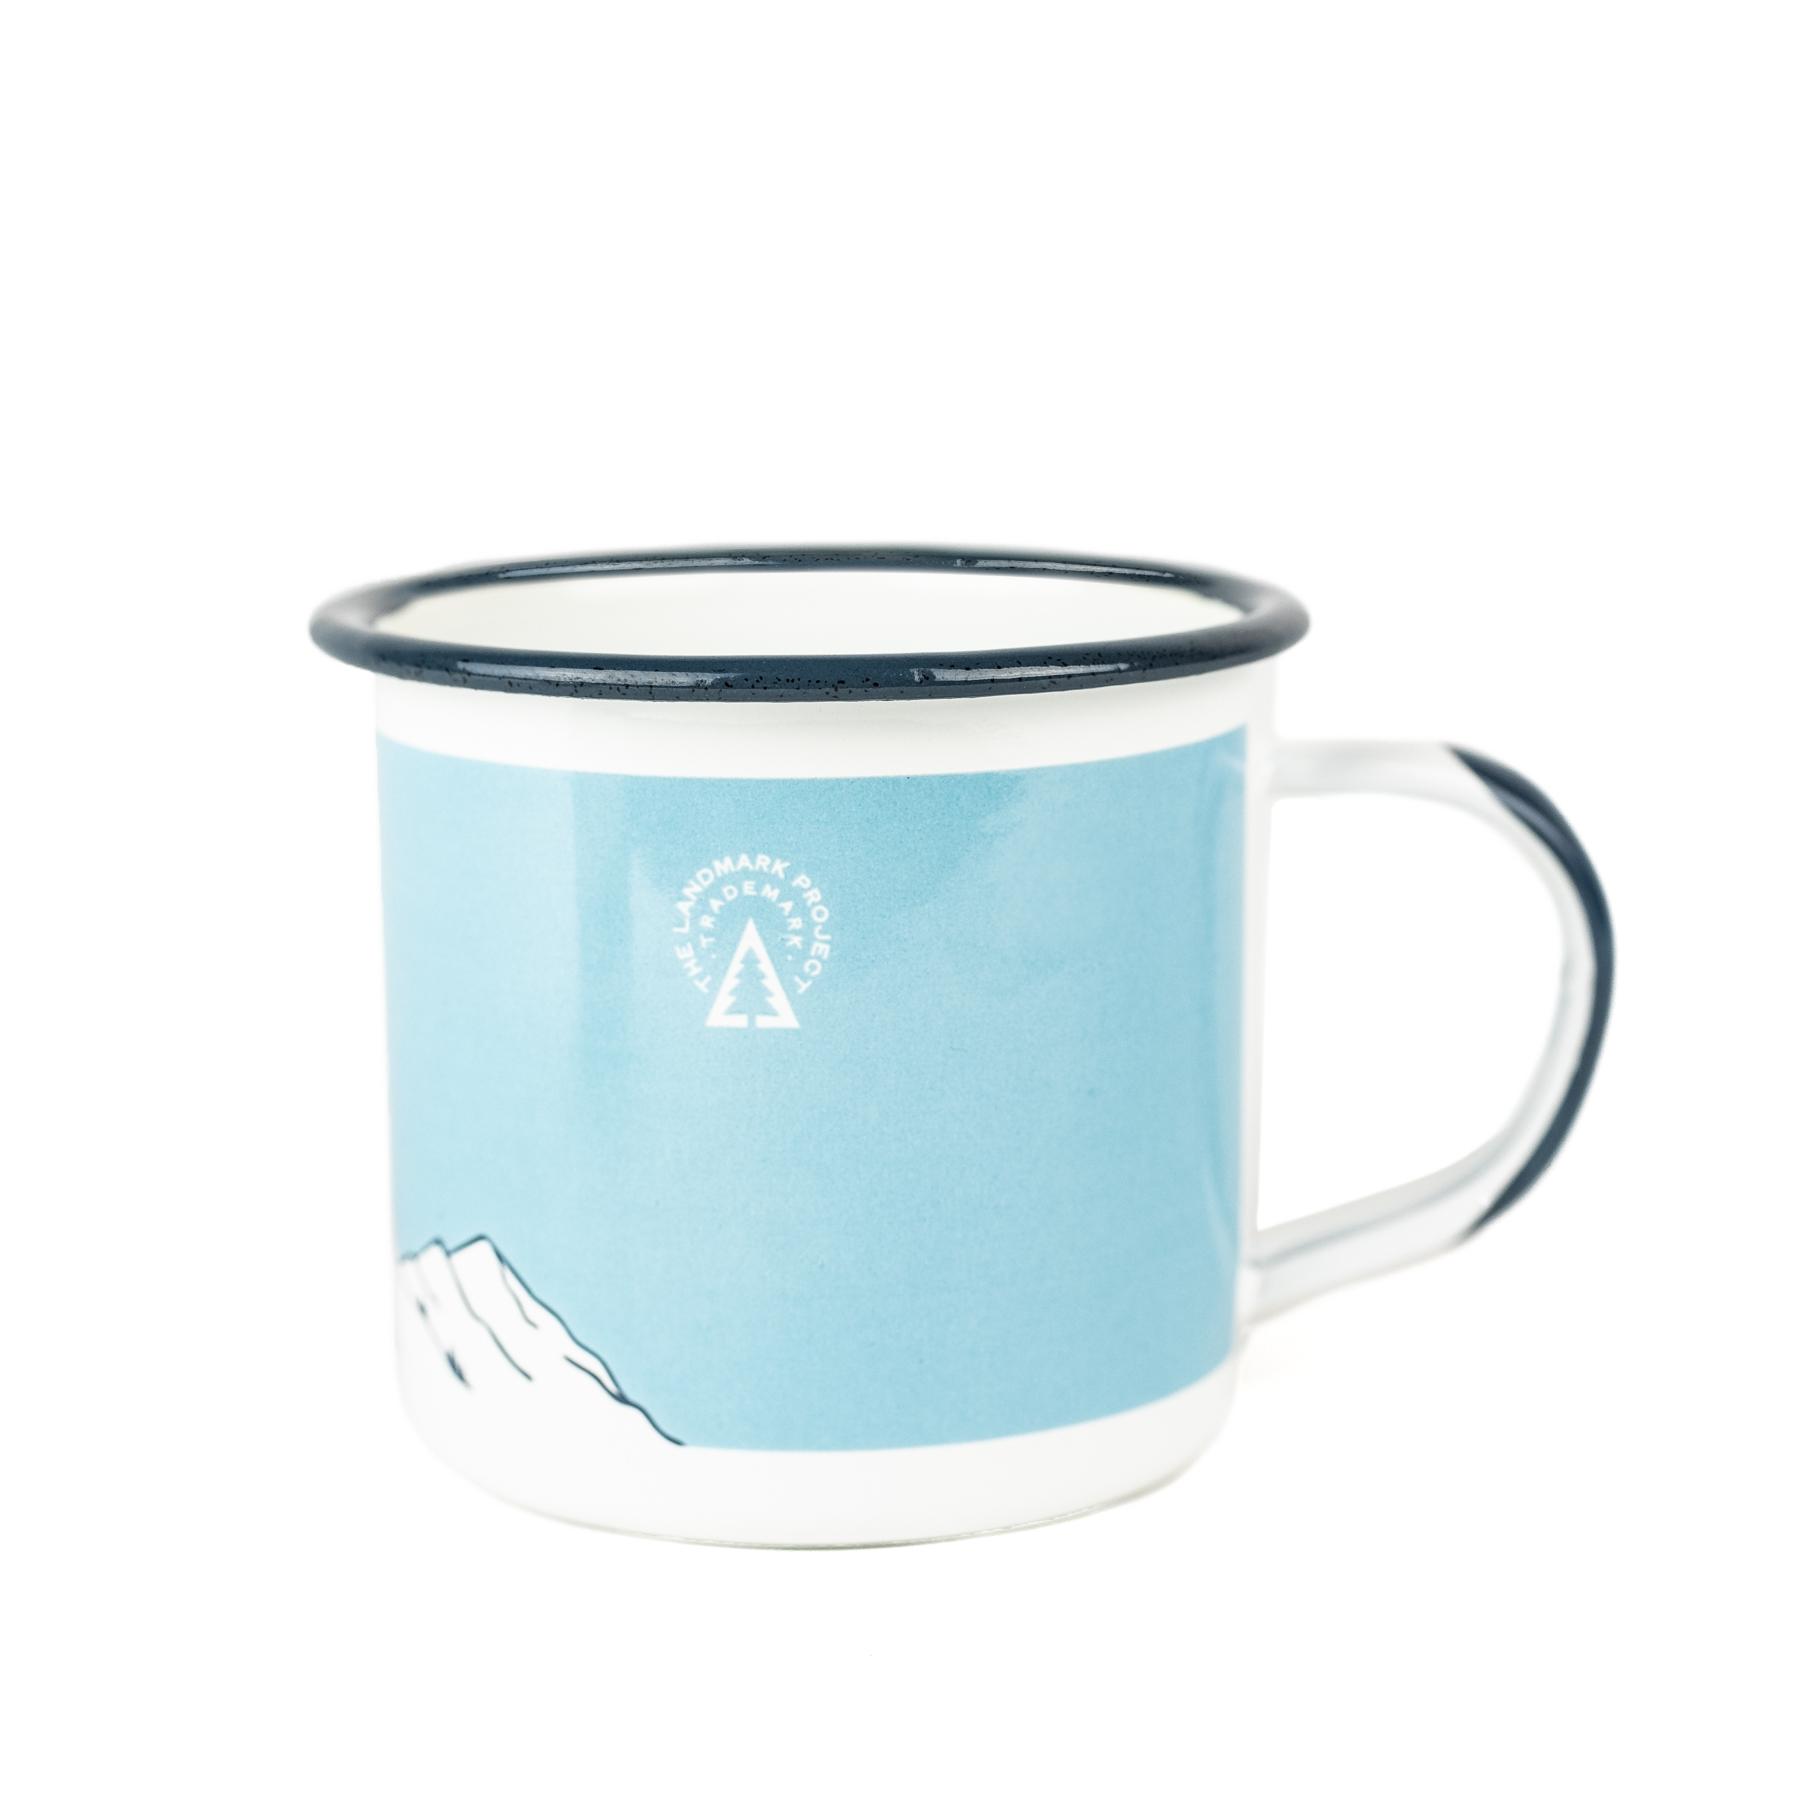 pacific-crest-trail-mug-4.jpg